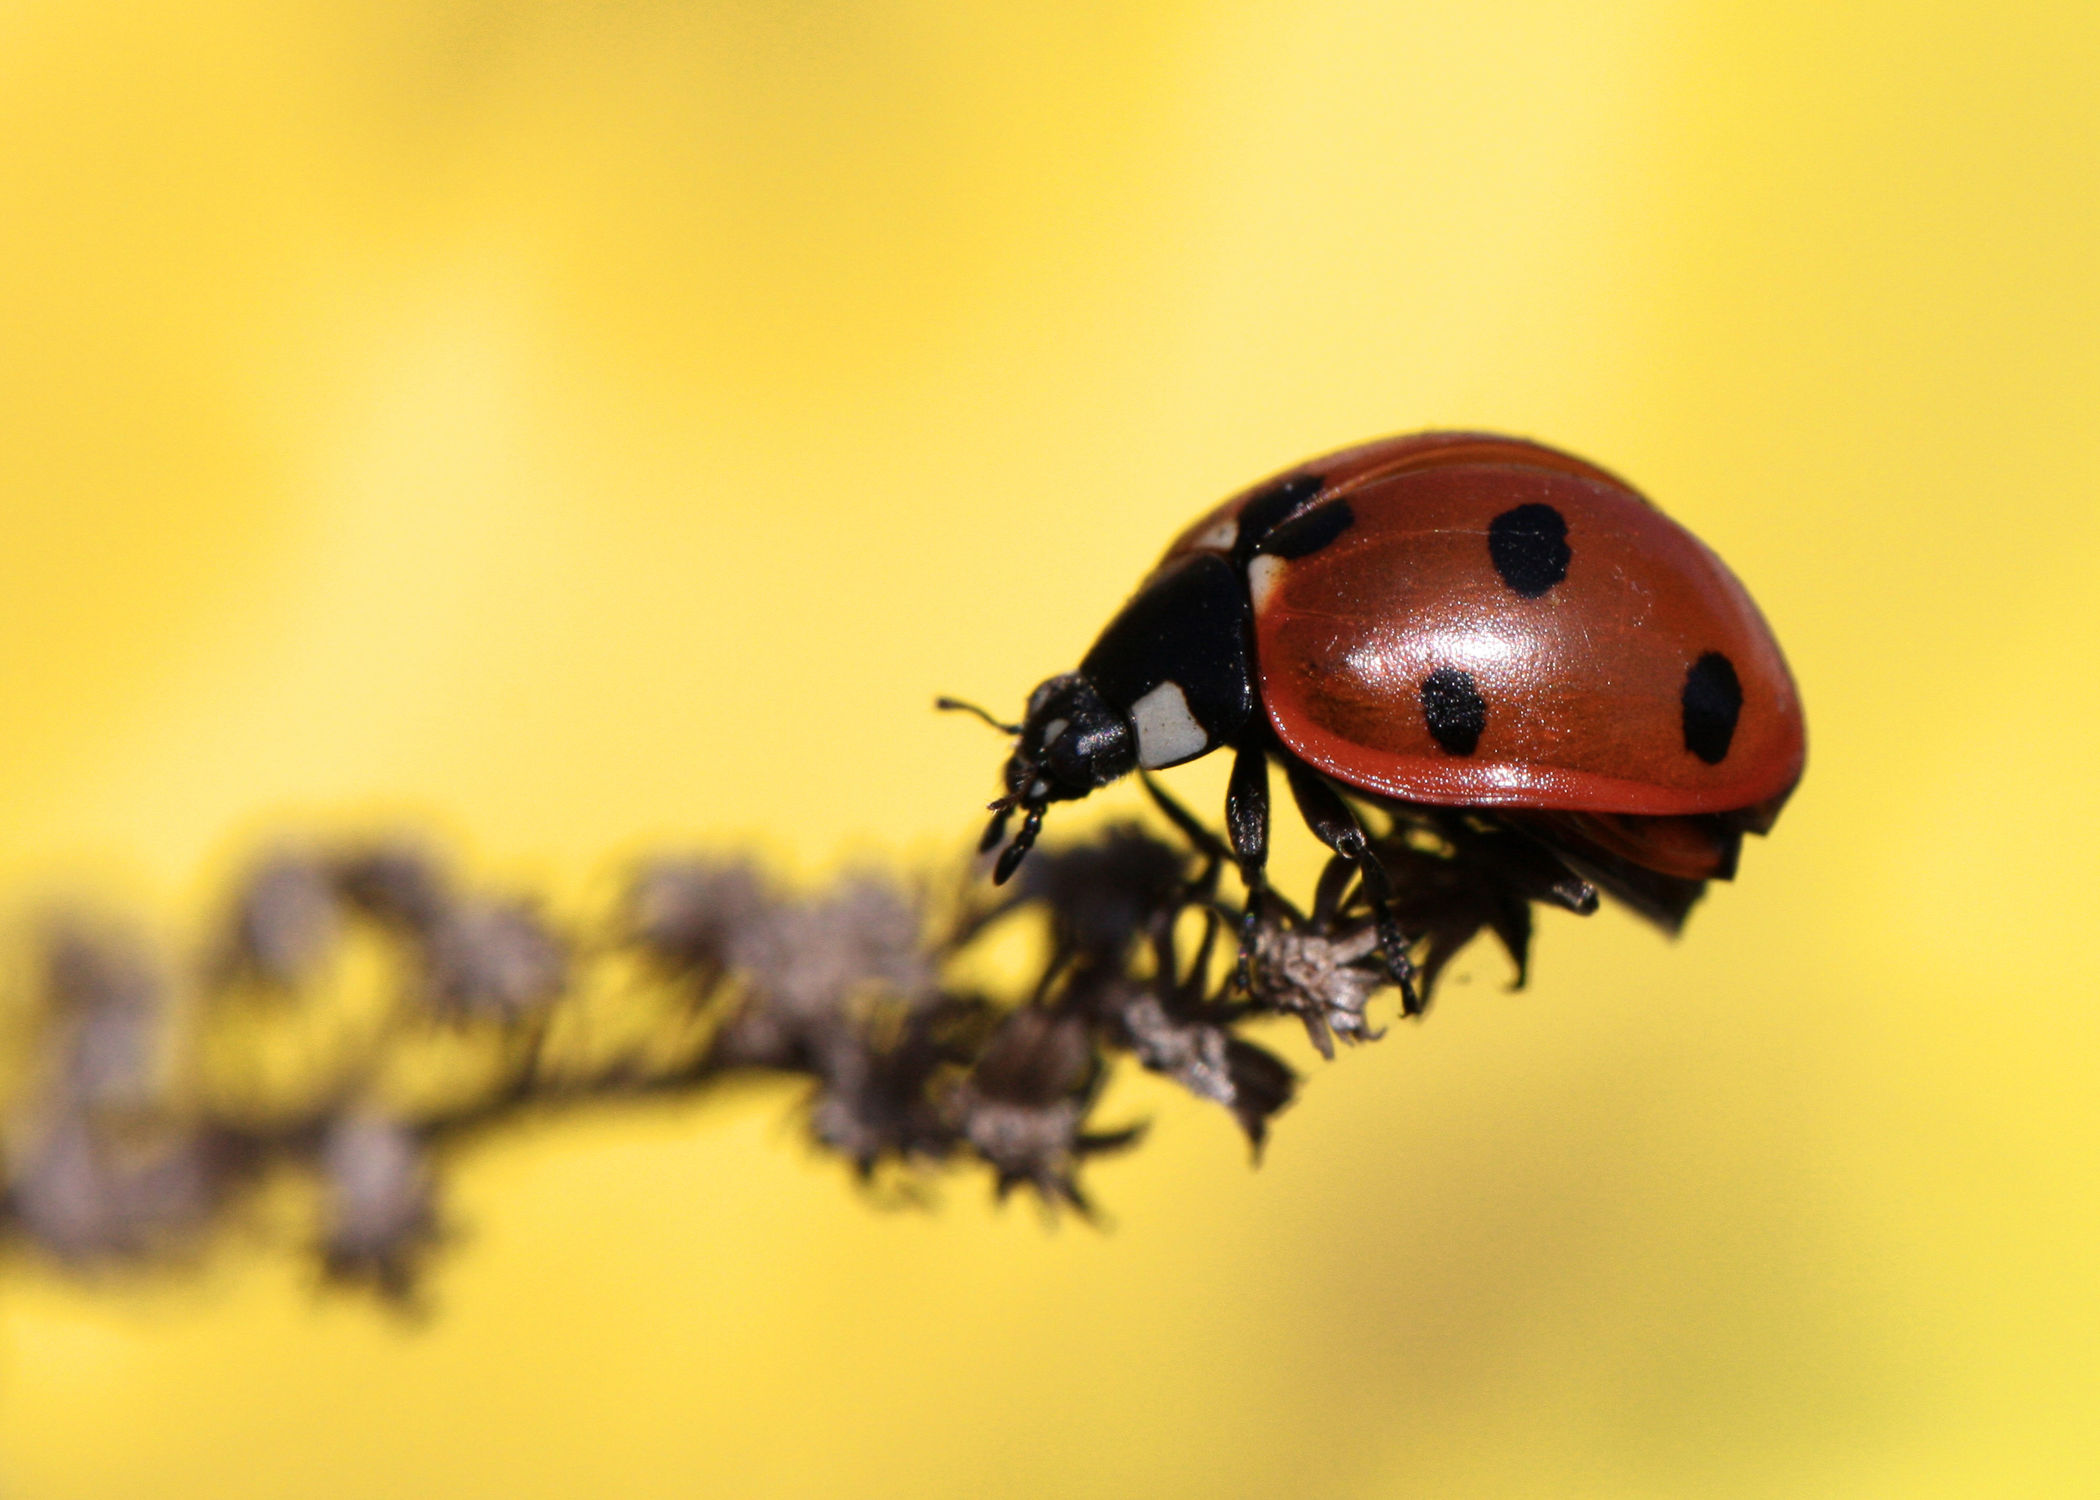 Bild mit Blumen, Frühling, Insekten, Blume, blue, Marienkäfer, Blüten, frühjahr, Insekt, Käfer